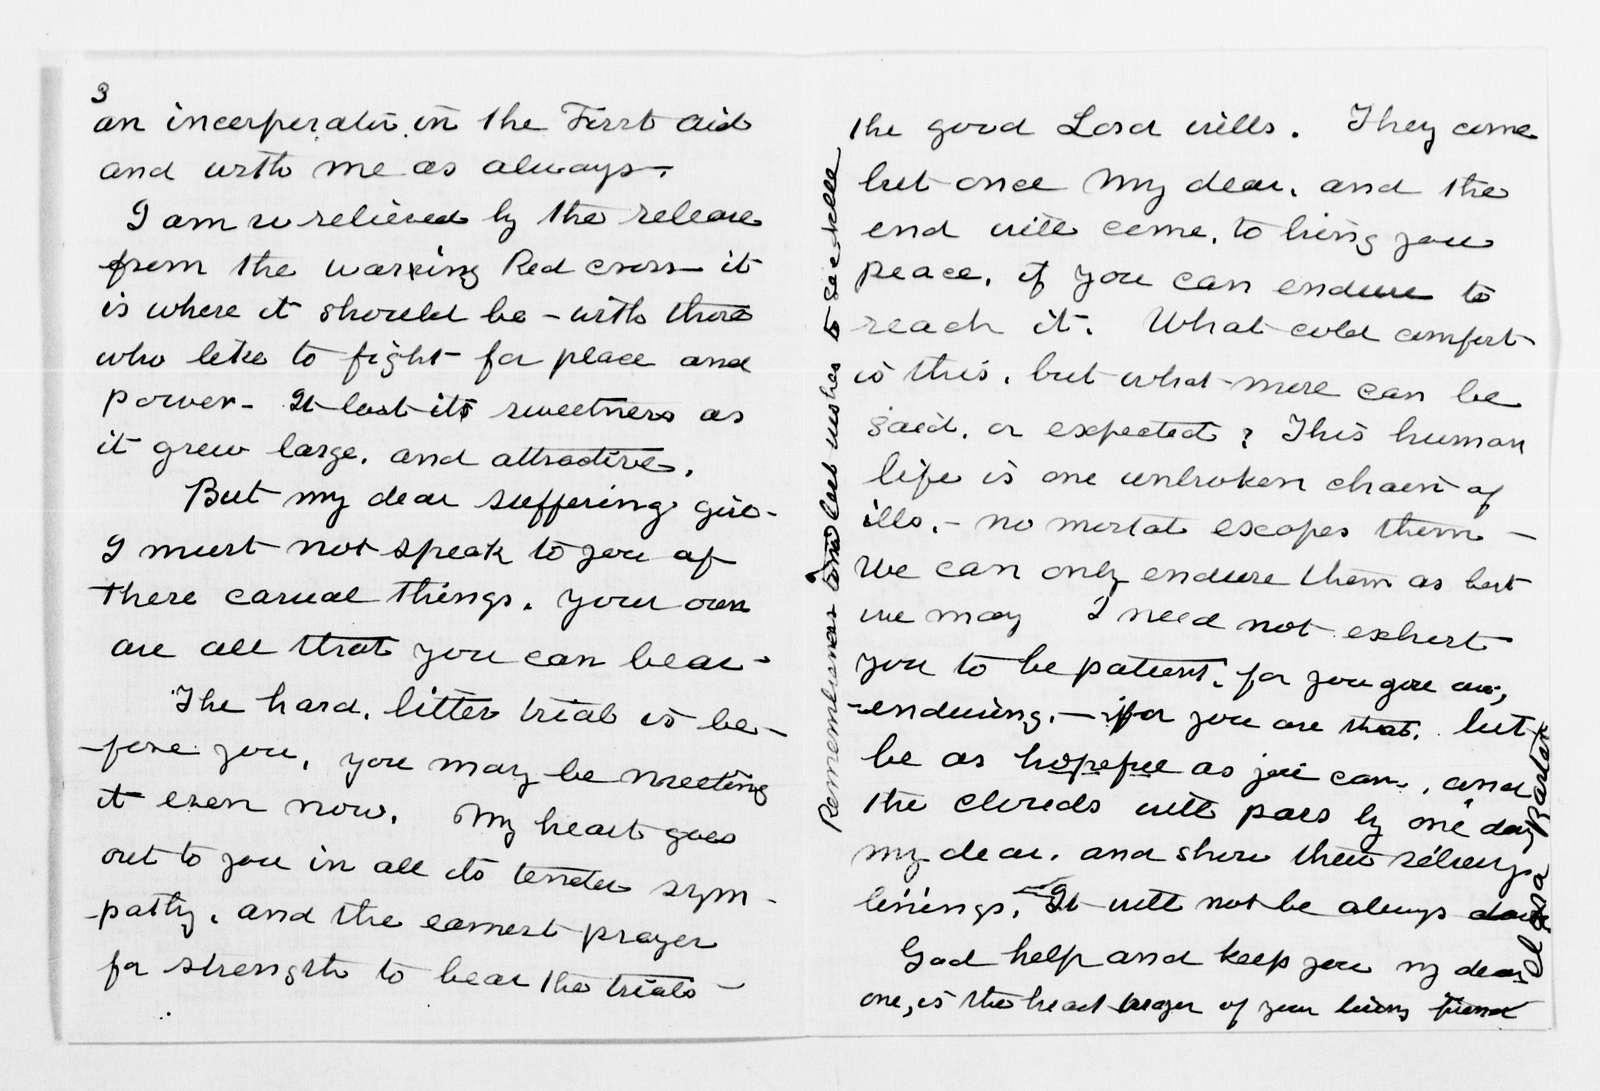 Clara Barton Papers: General Correspondence, 1838-1912; Halstead, Leonora B., 1890-1911, undated